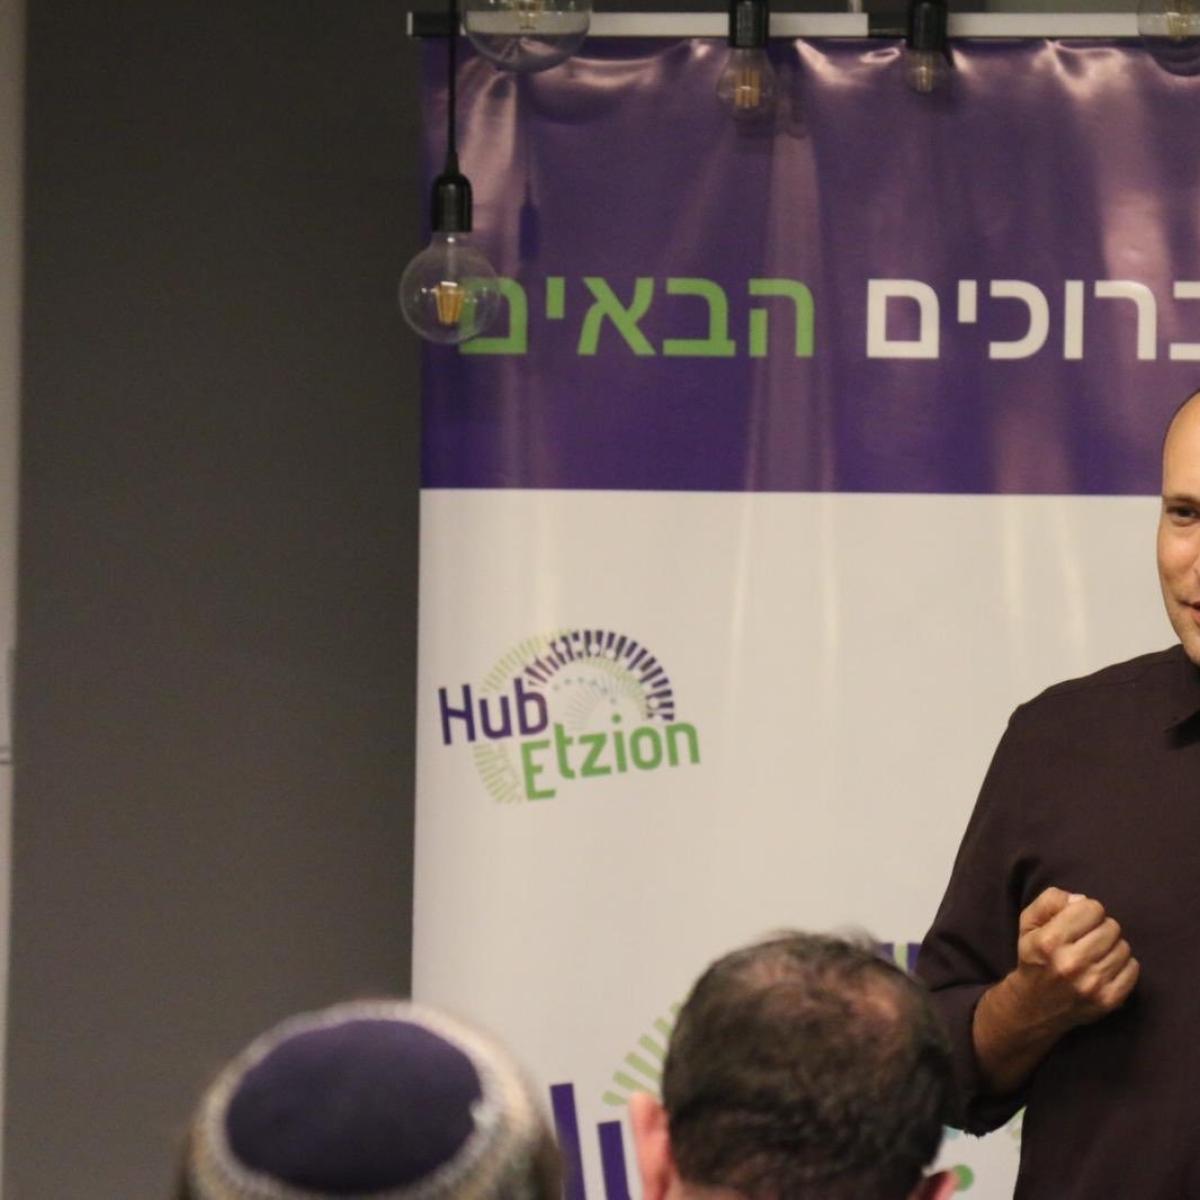 Israel appoints Naftali Bennett as new Defence Minister